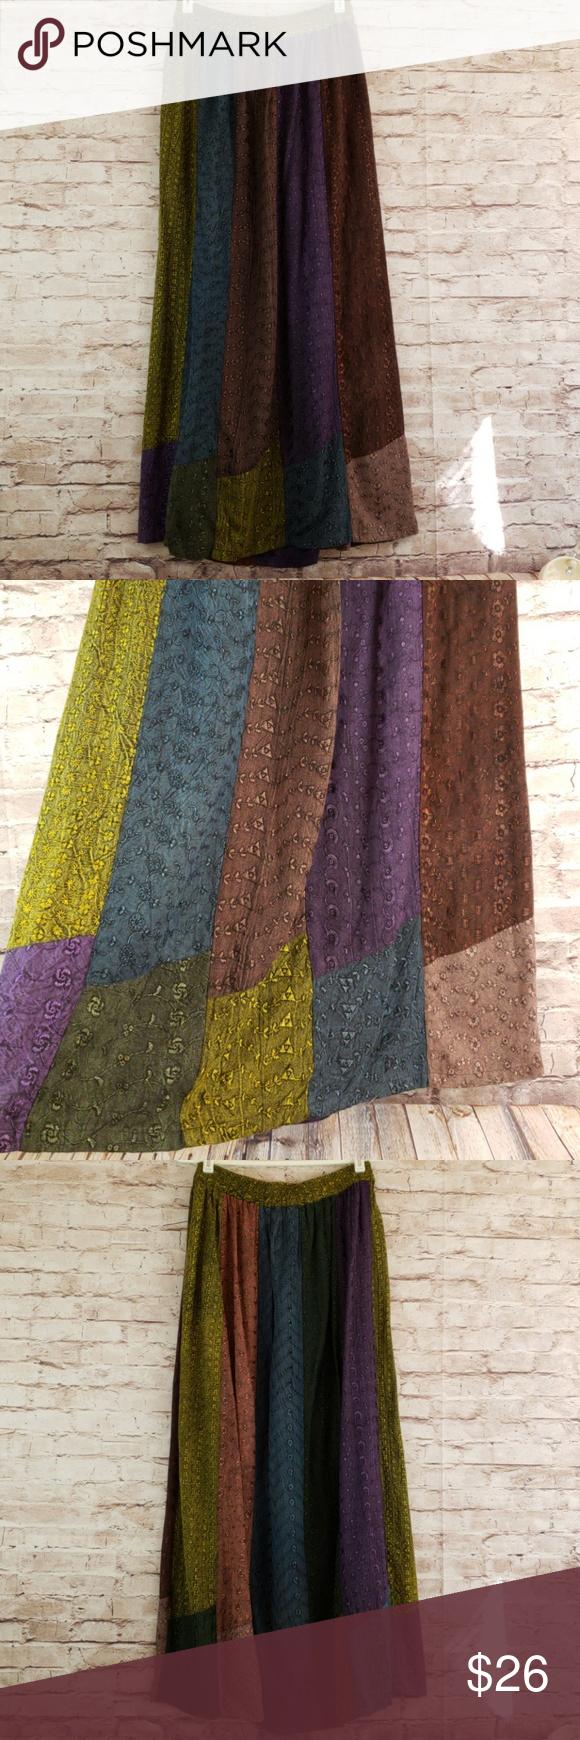 9aa420d369 Sacred Threads Boho Maxi Skirt Sacred Threads patchwork eyelet maxi skirt  with elastic waist size S/M Sacred Threads Skirts Maxi